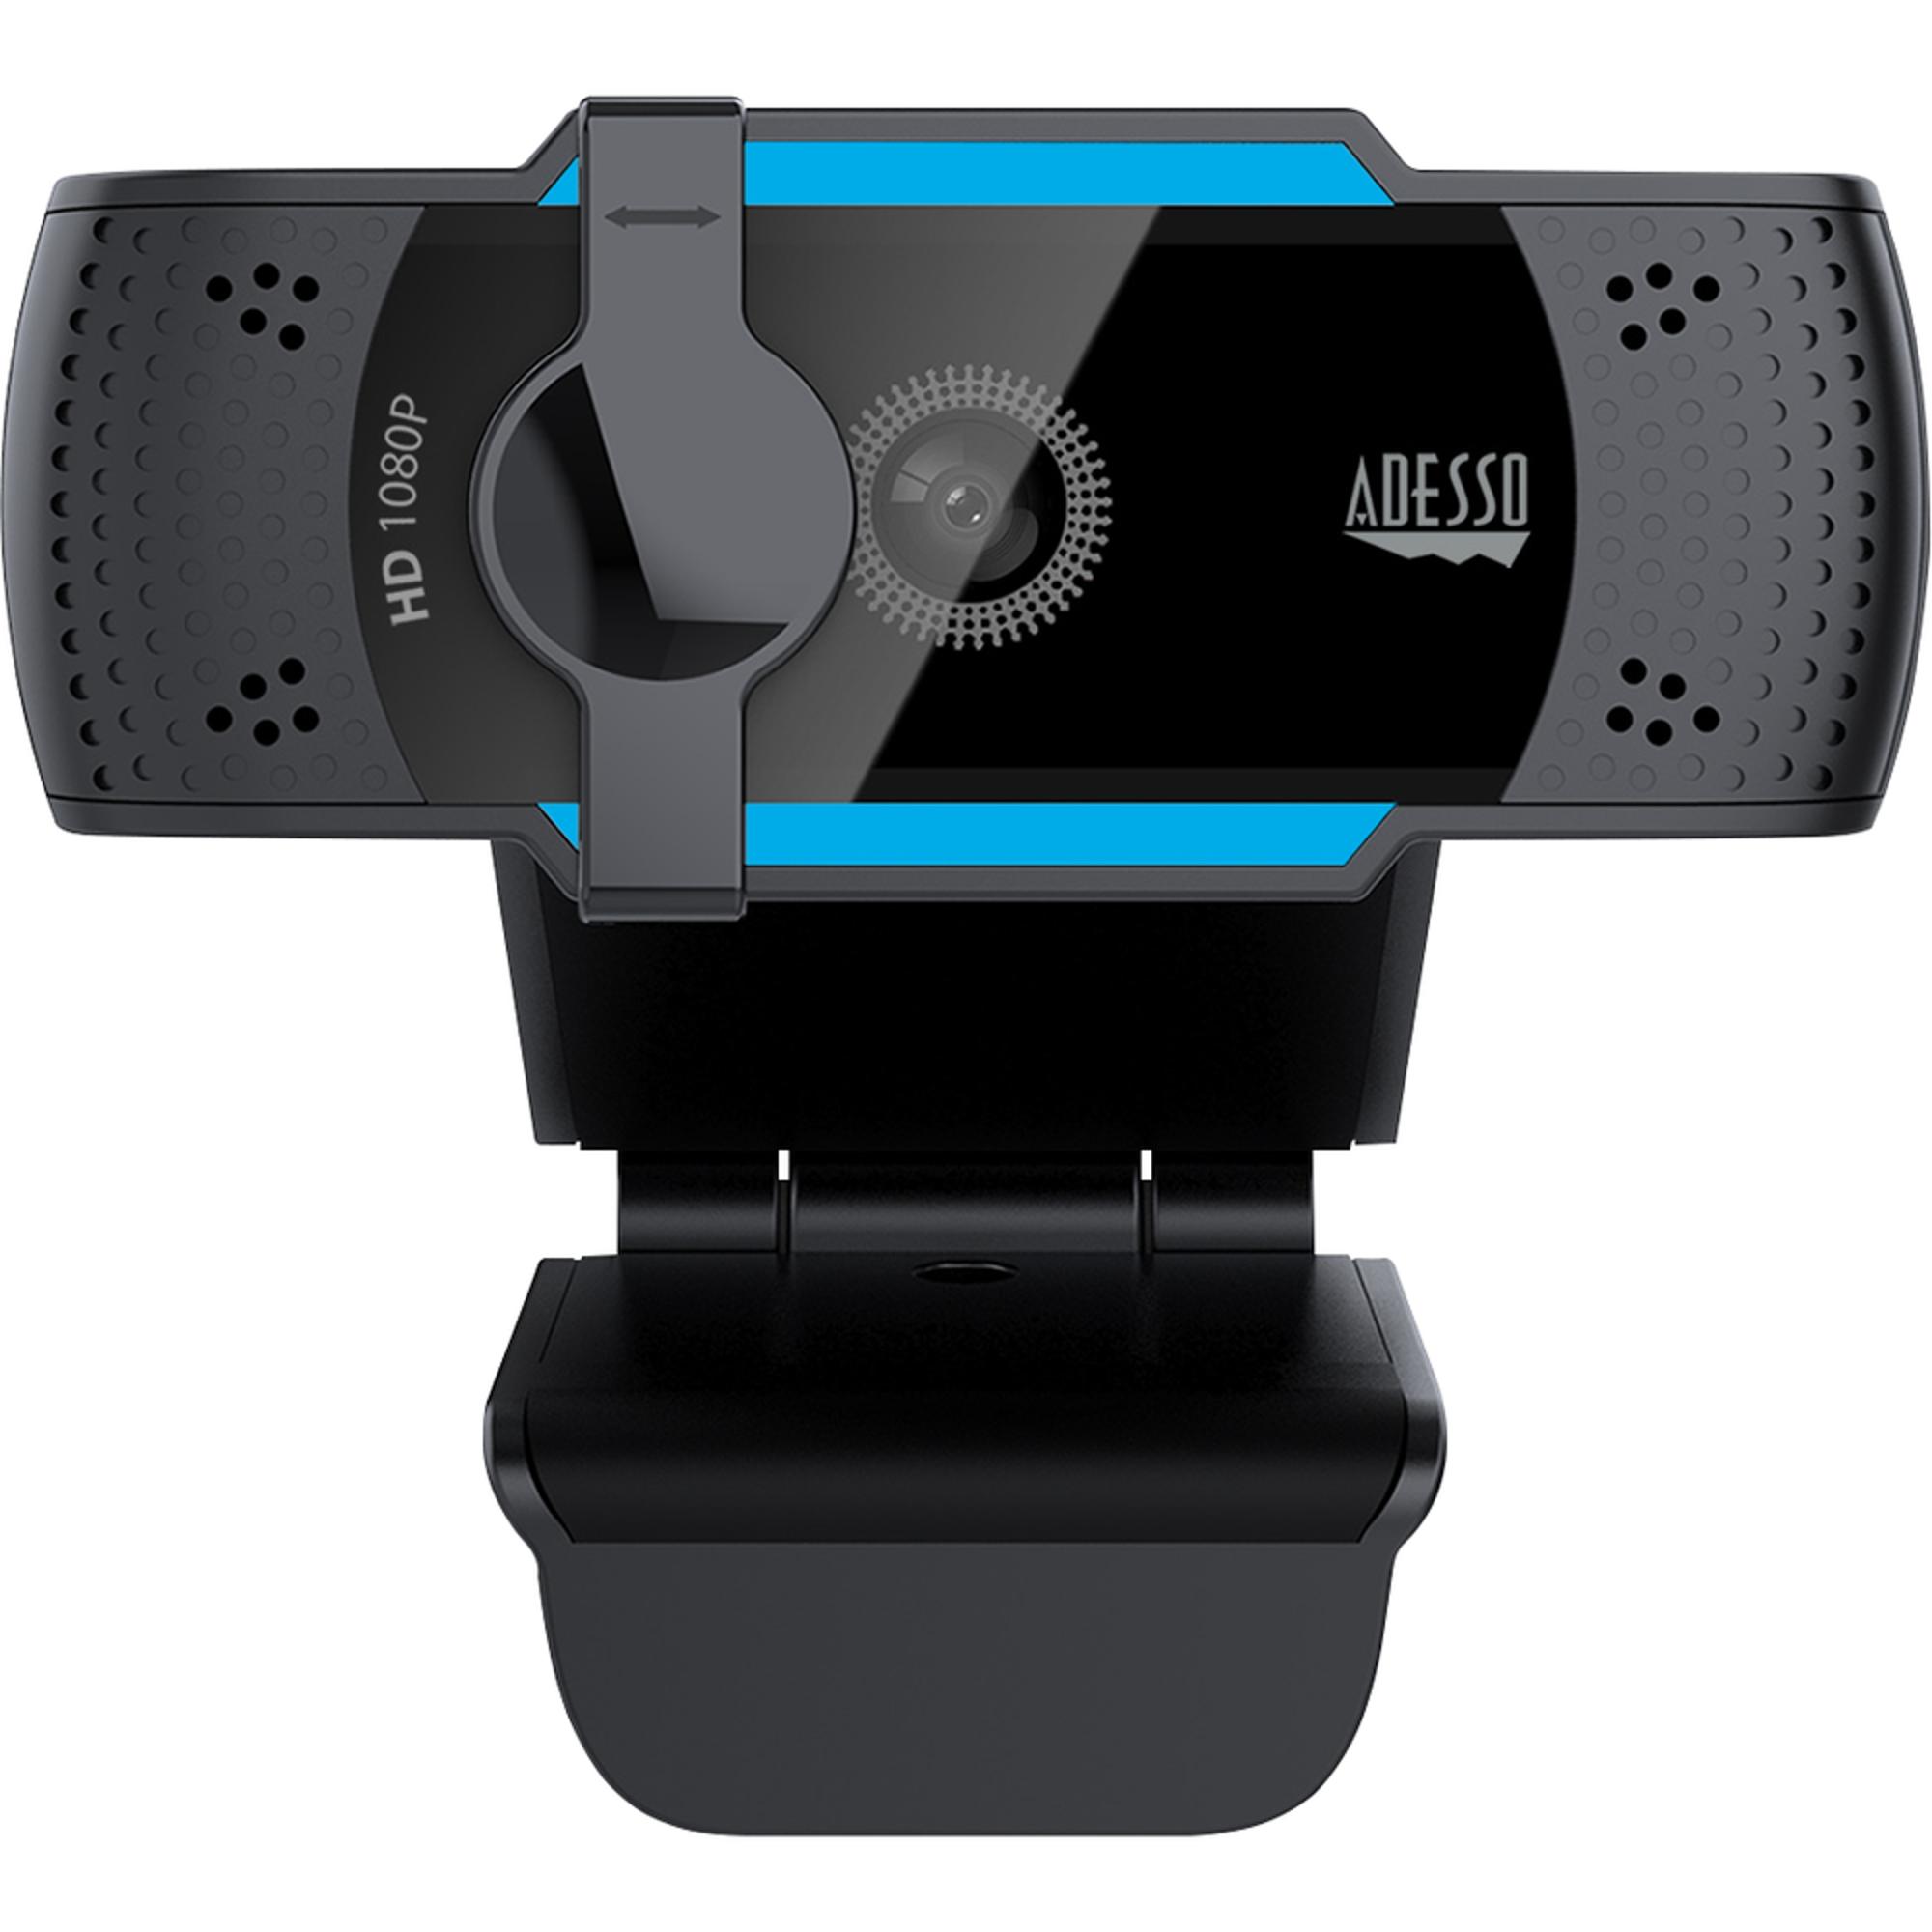 image of: Adesso 1080P HD Webcam w-Built-in Dual Mic Tripod Mnt Privcy Shttr Cvr - Black 2.7X2.7X1.97in 1Ct Box Noise Cancelling